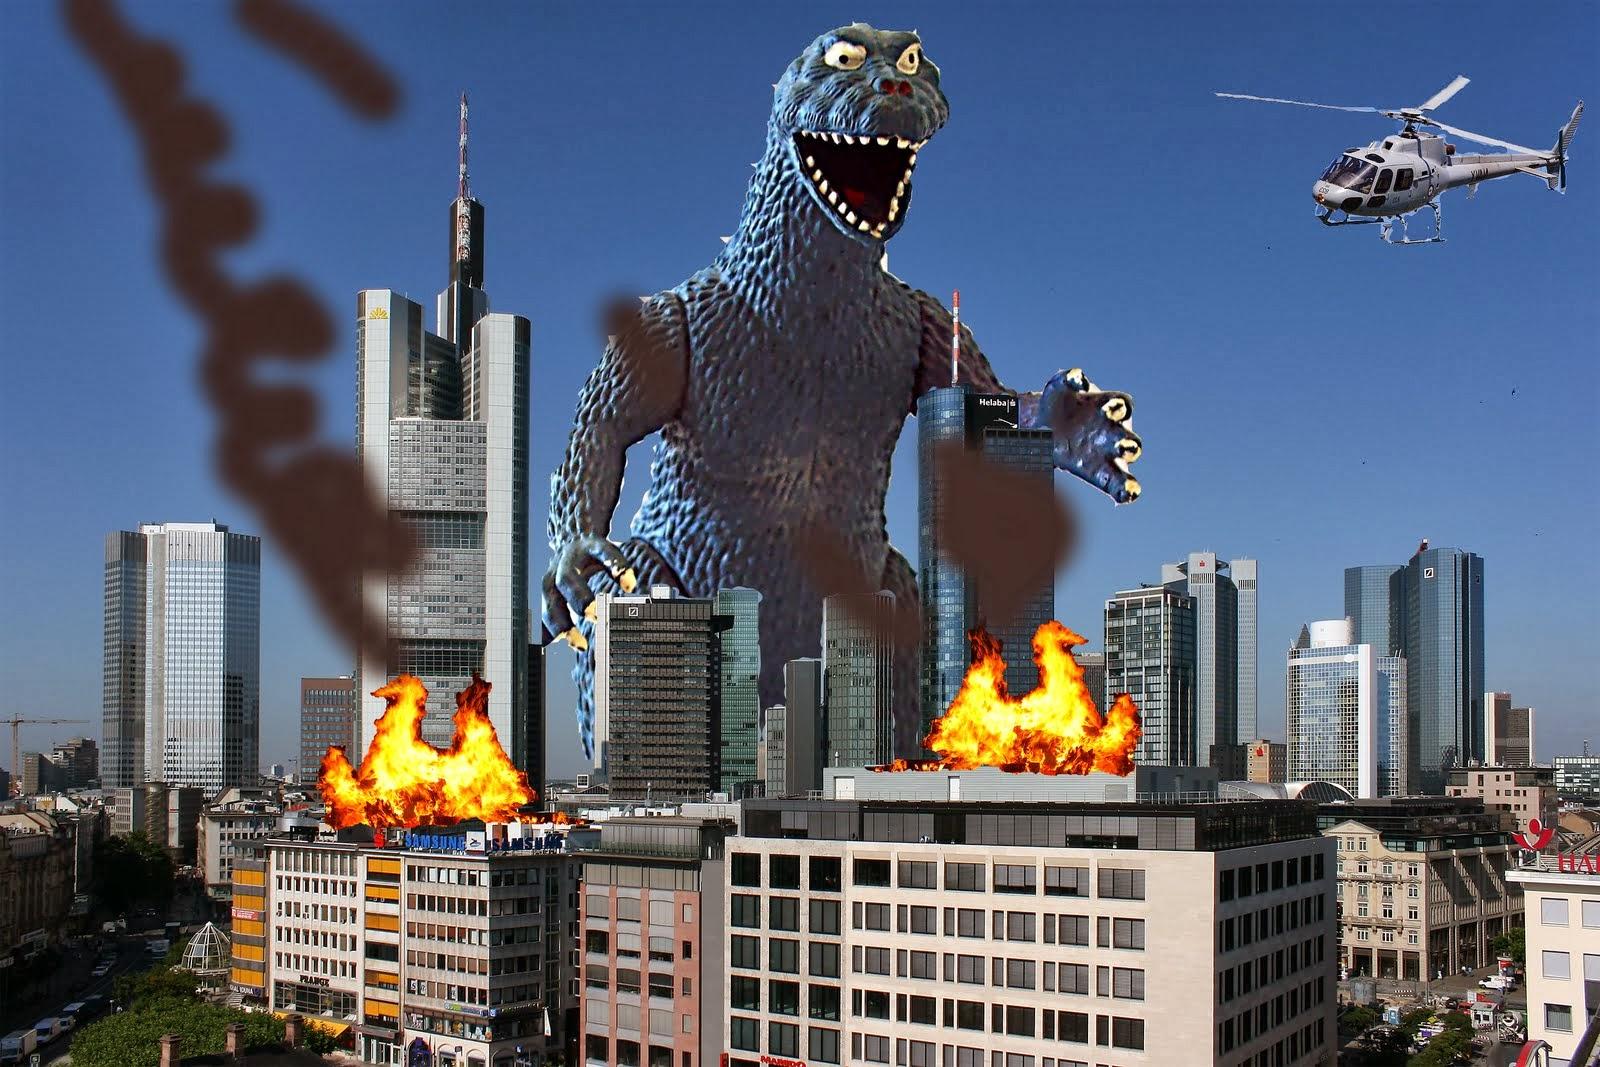 Majority would prefer devastating attack Godzilla boring Euro crisis: survey